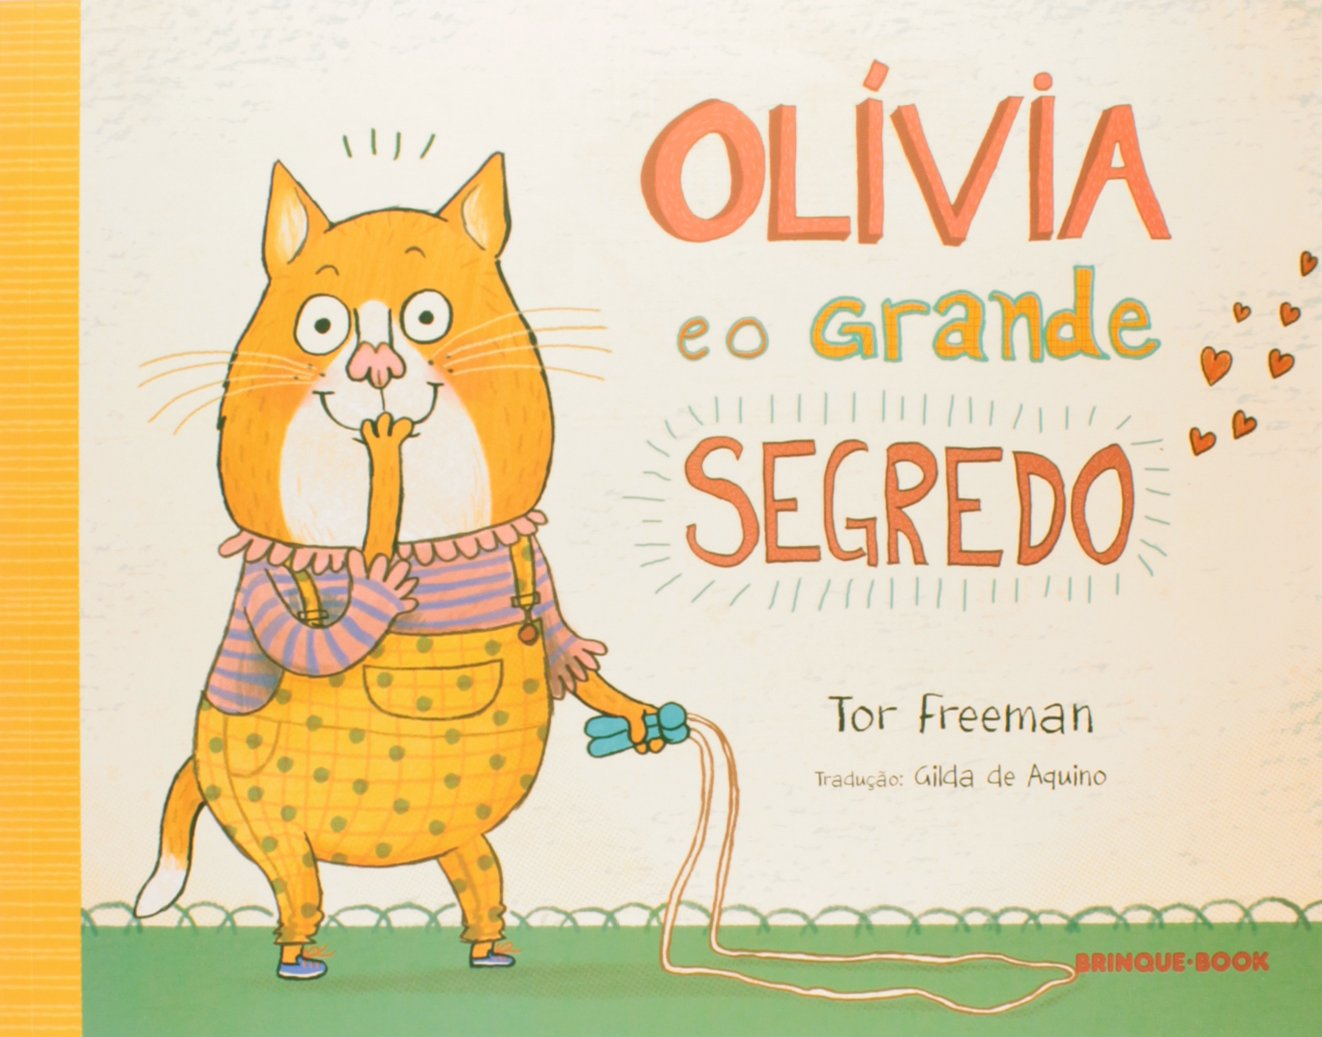 Olívia e o Grande Segredo - 9788574124339 - Livros na Amazon Brasil